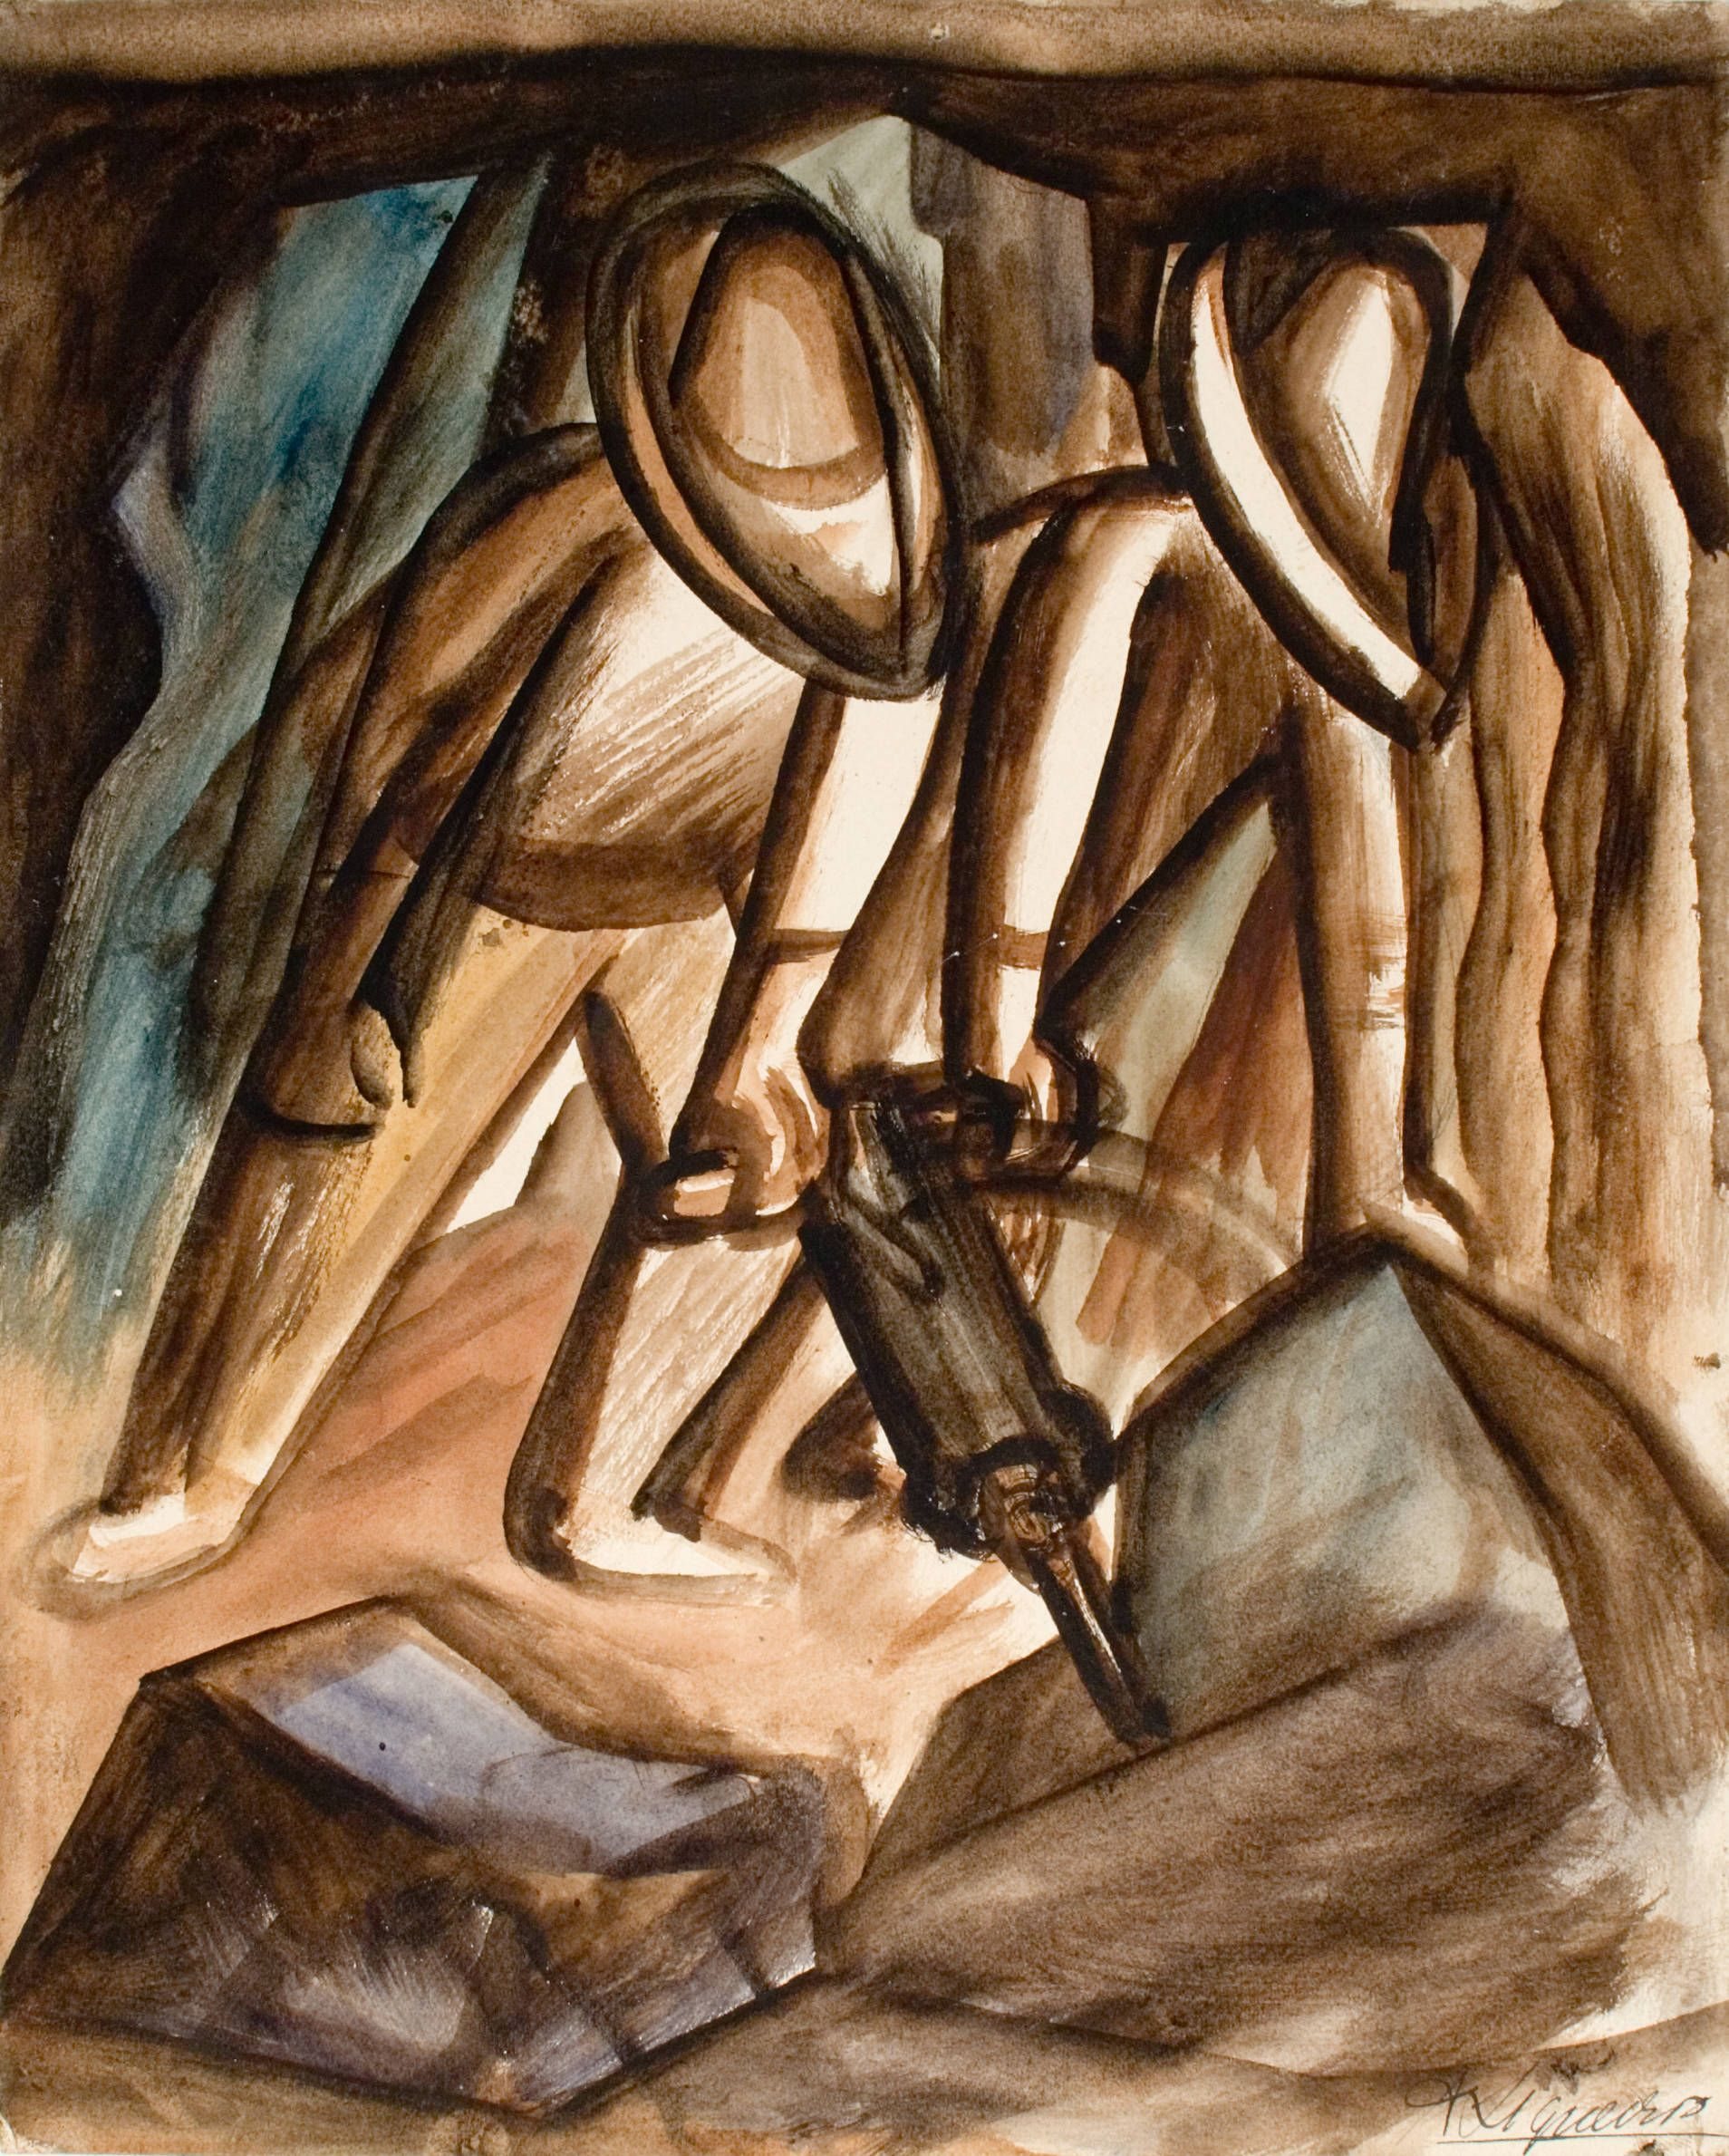 The Workers, David Alfaro Siqueiros.